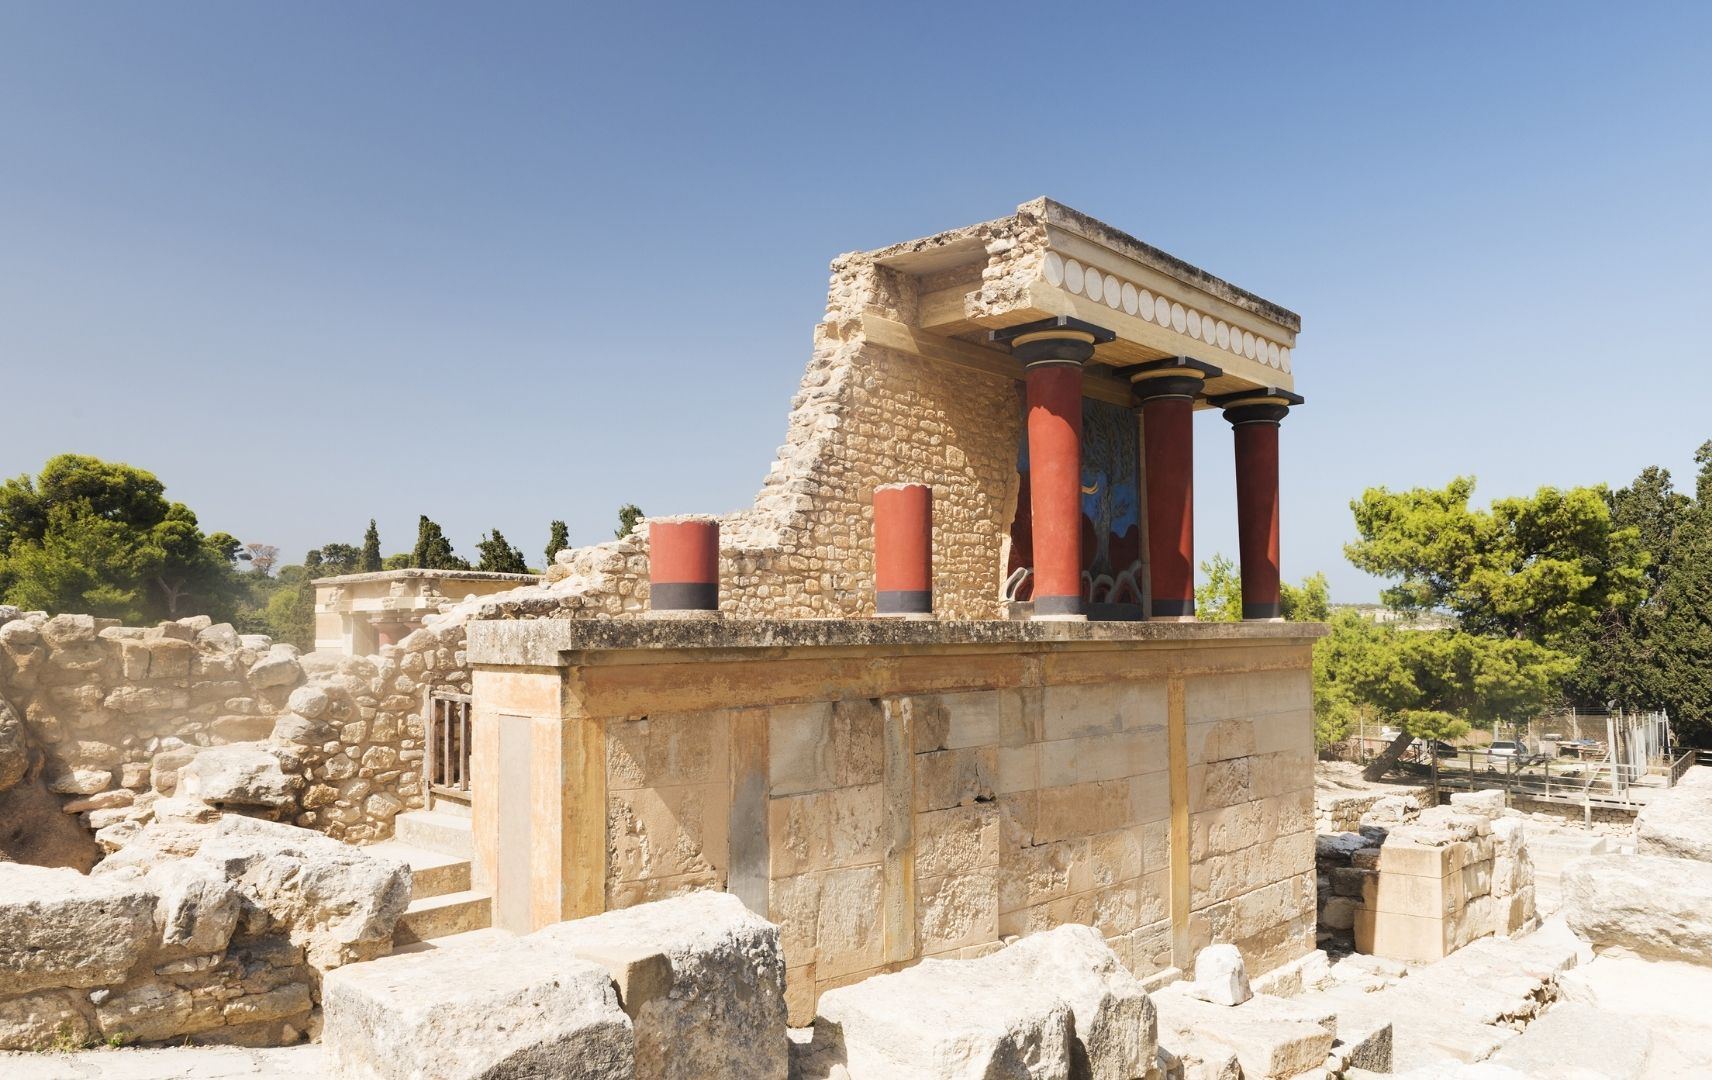 Reiseziel Kreta - Knossos